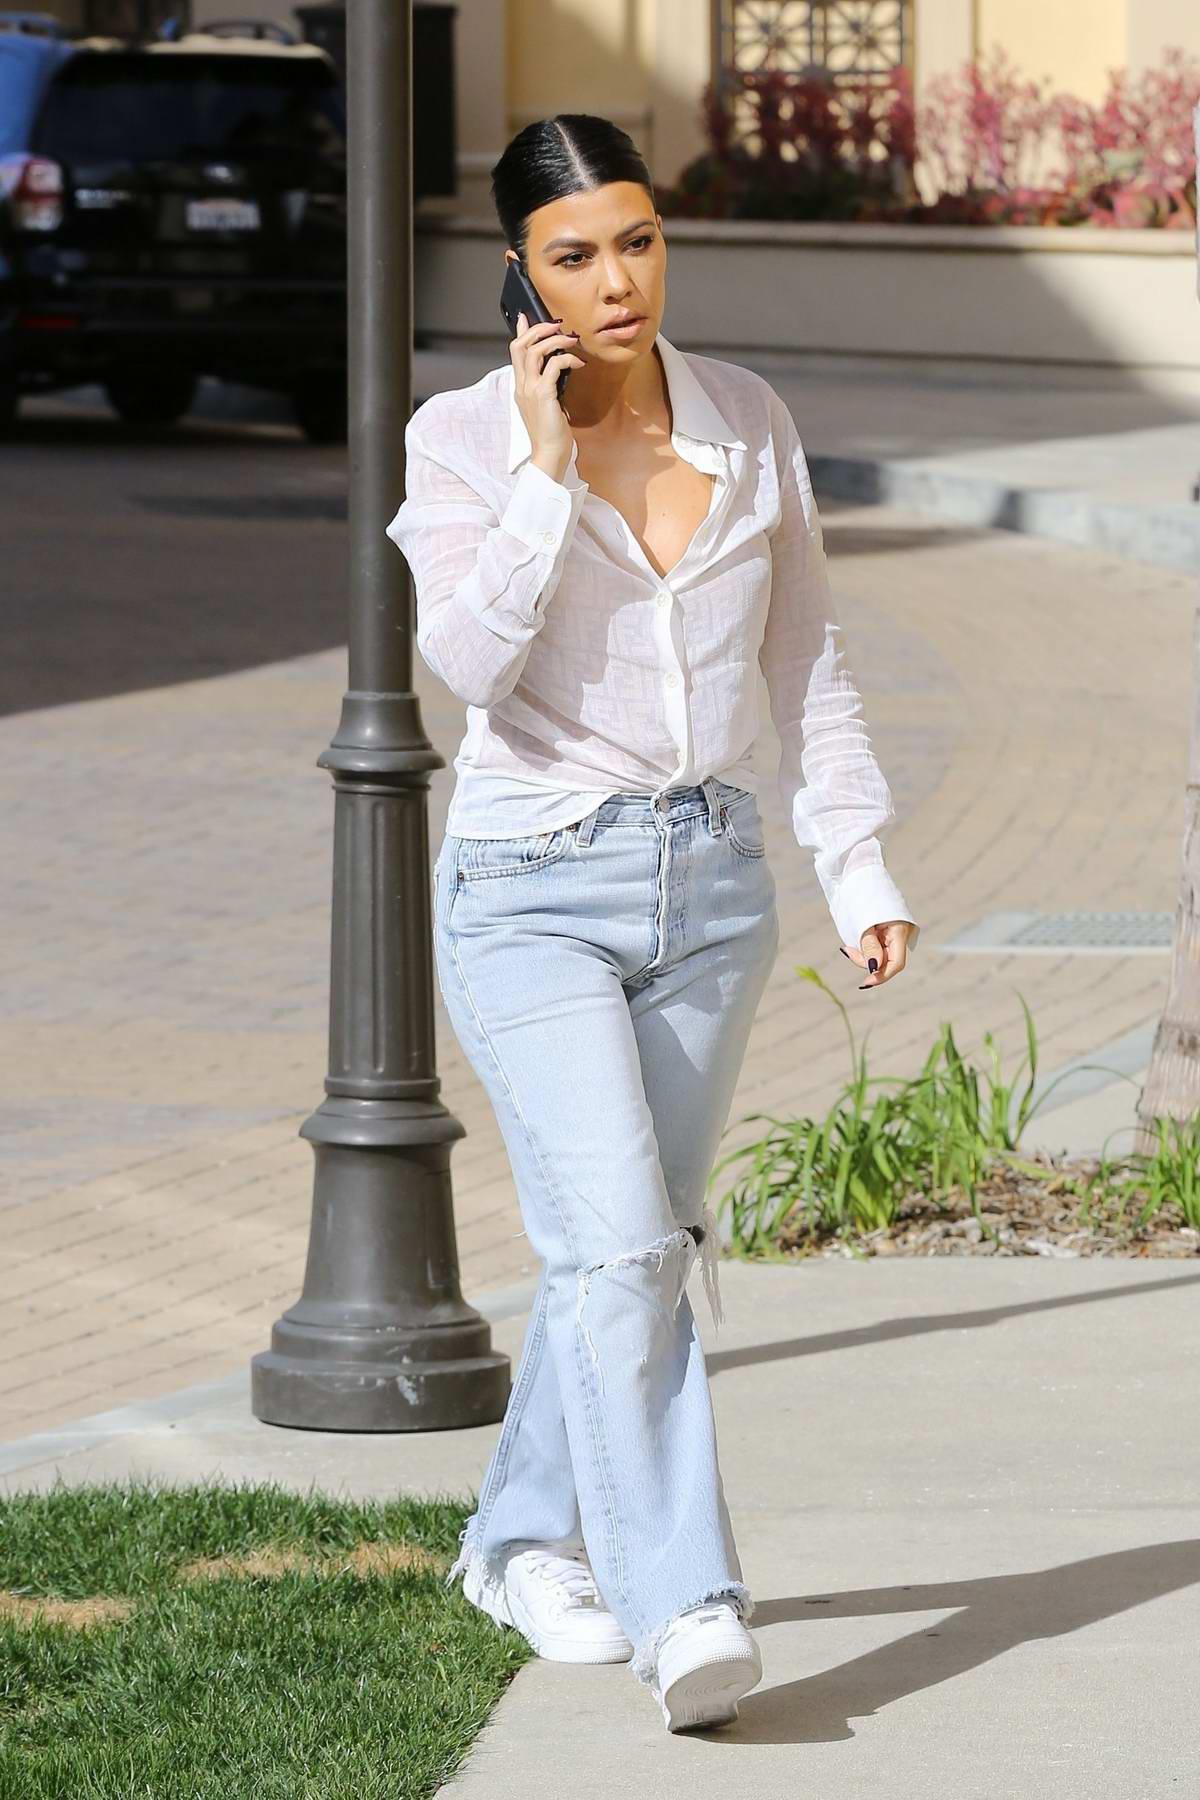 Kourtney Kardashian rocks a white Fendi Shirt and ripped jeans while out in Calabasas, California